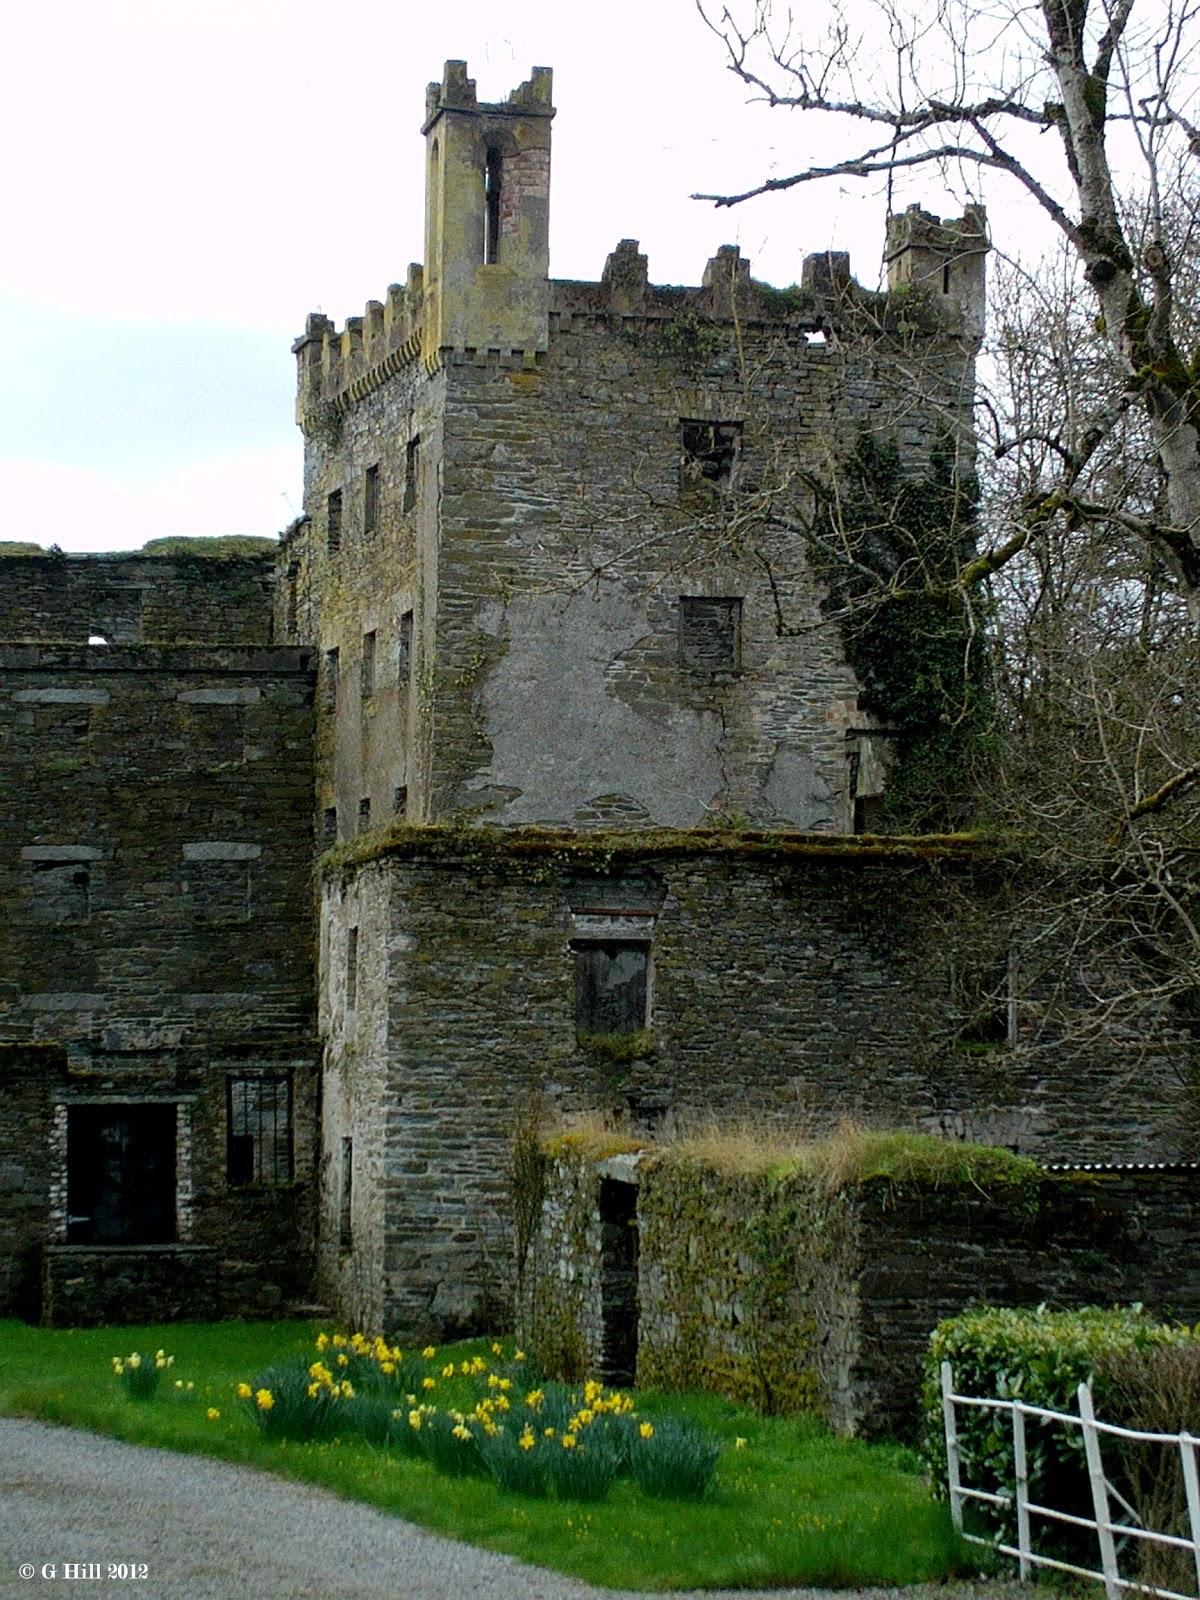 Ireland In Ruins: Moone Mill Co Kildare